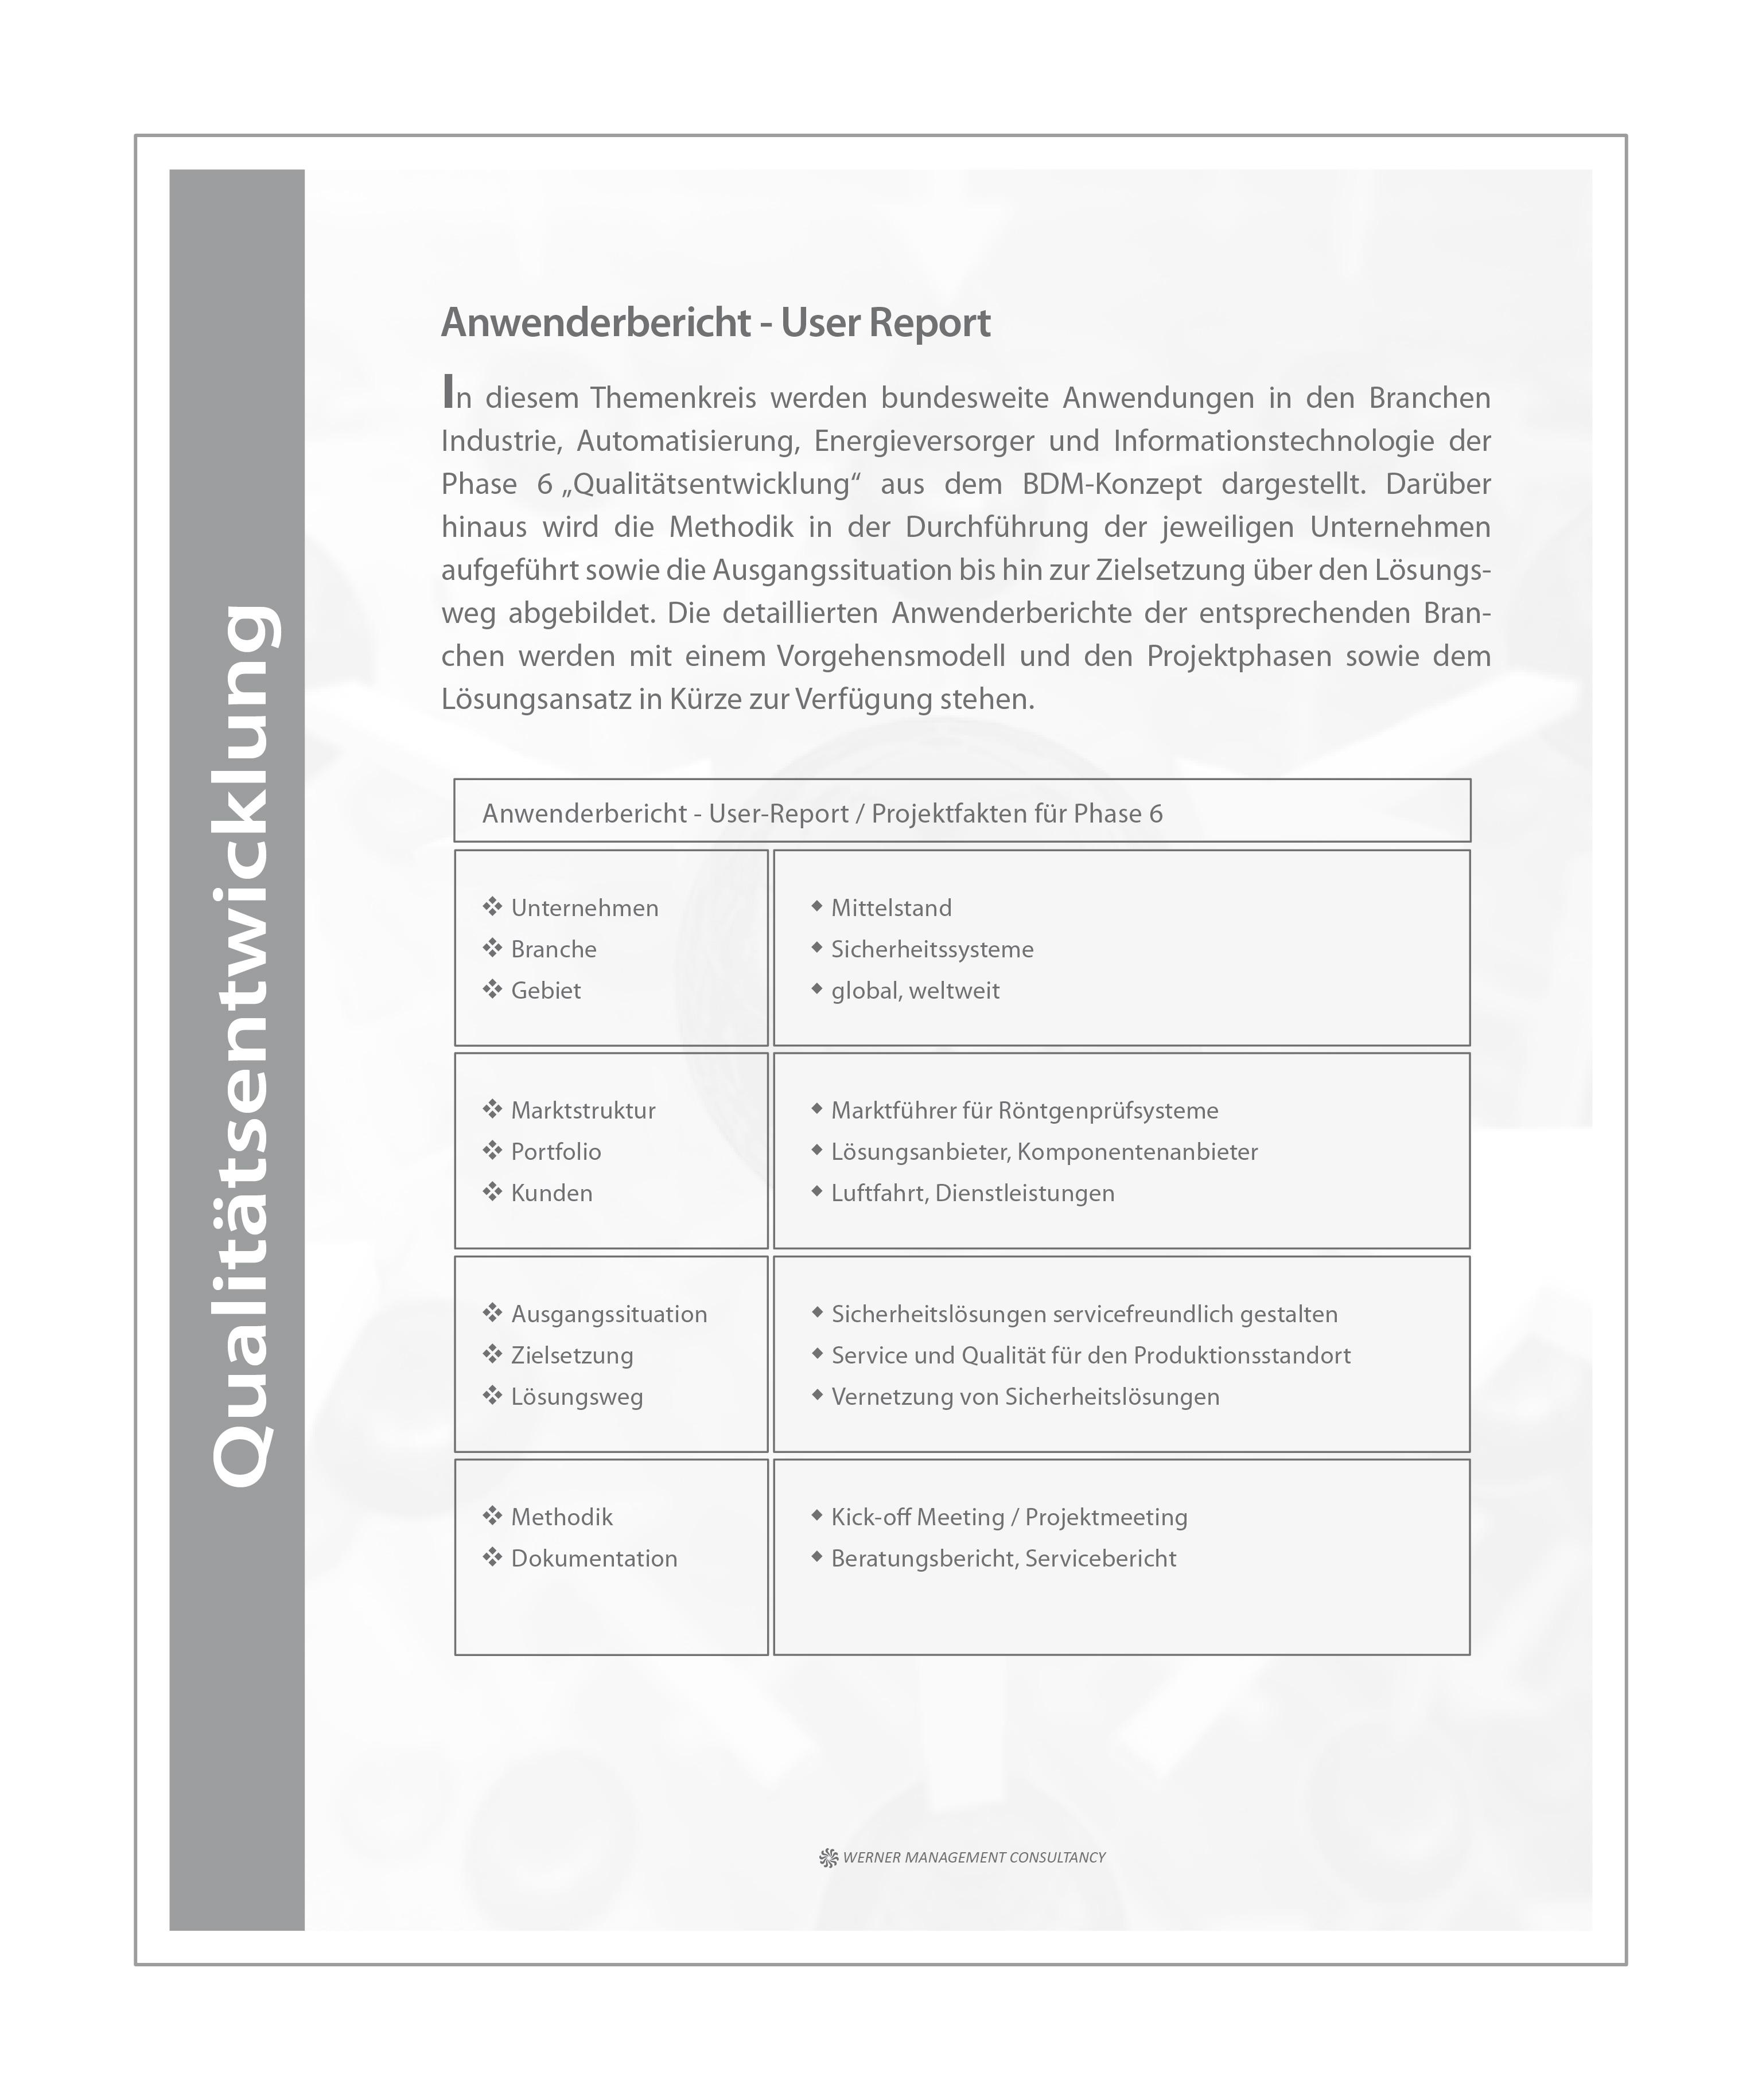 WMC Broschüre Business Development Phase-6 Anwenderbericht